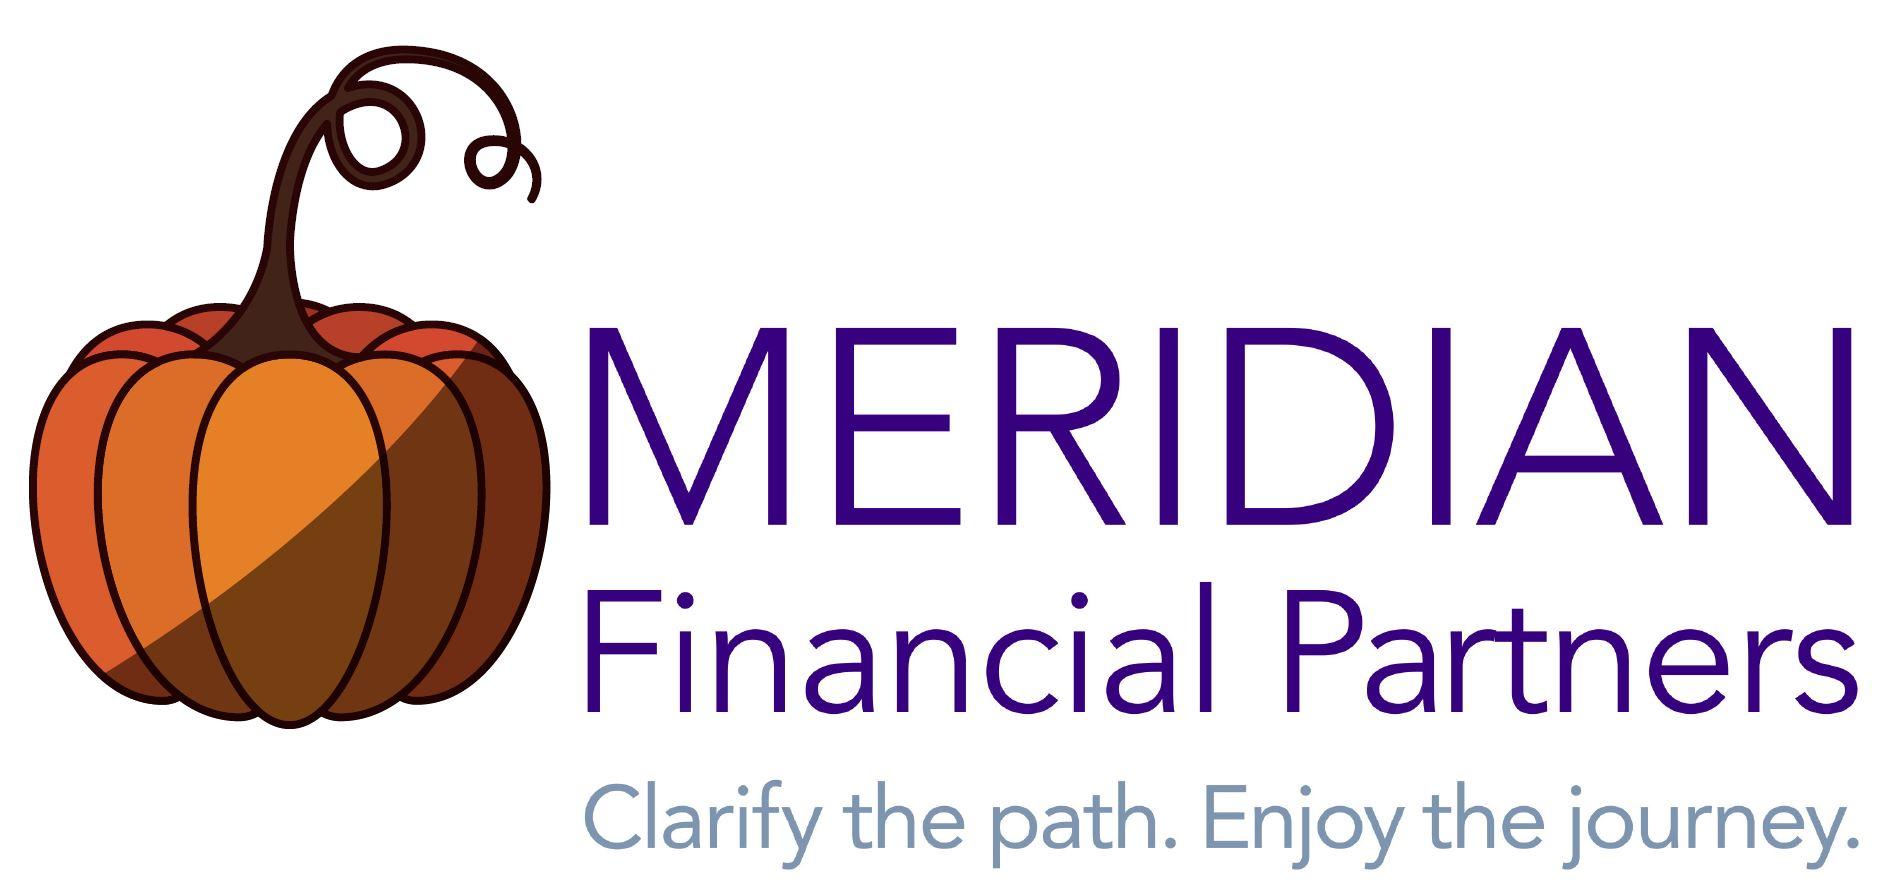 Meridian Financial Partners